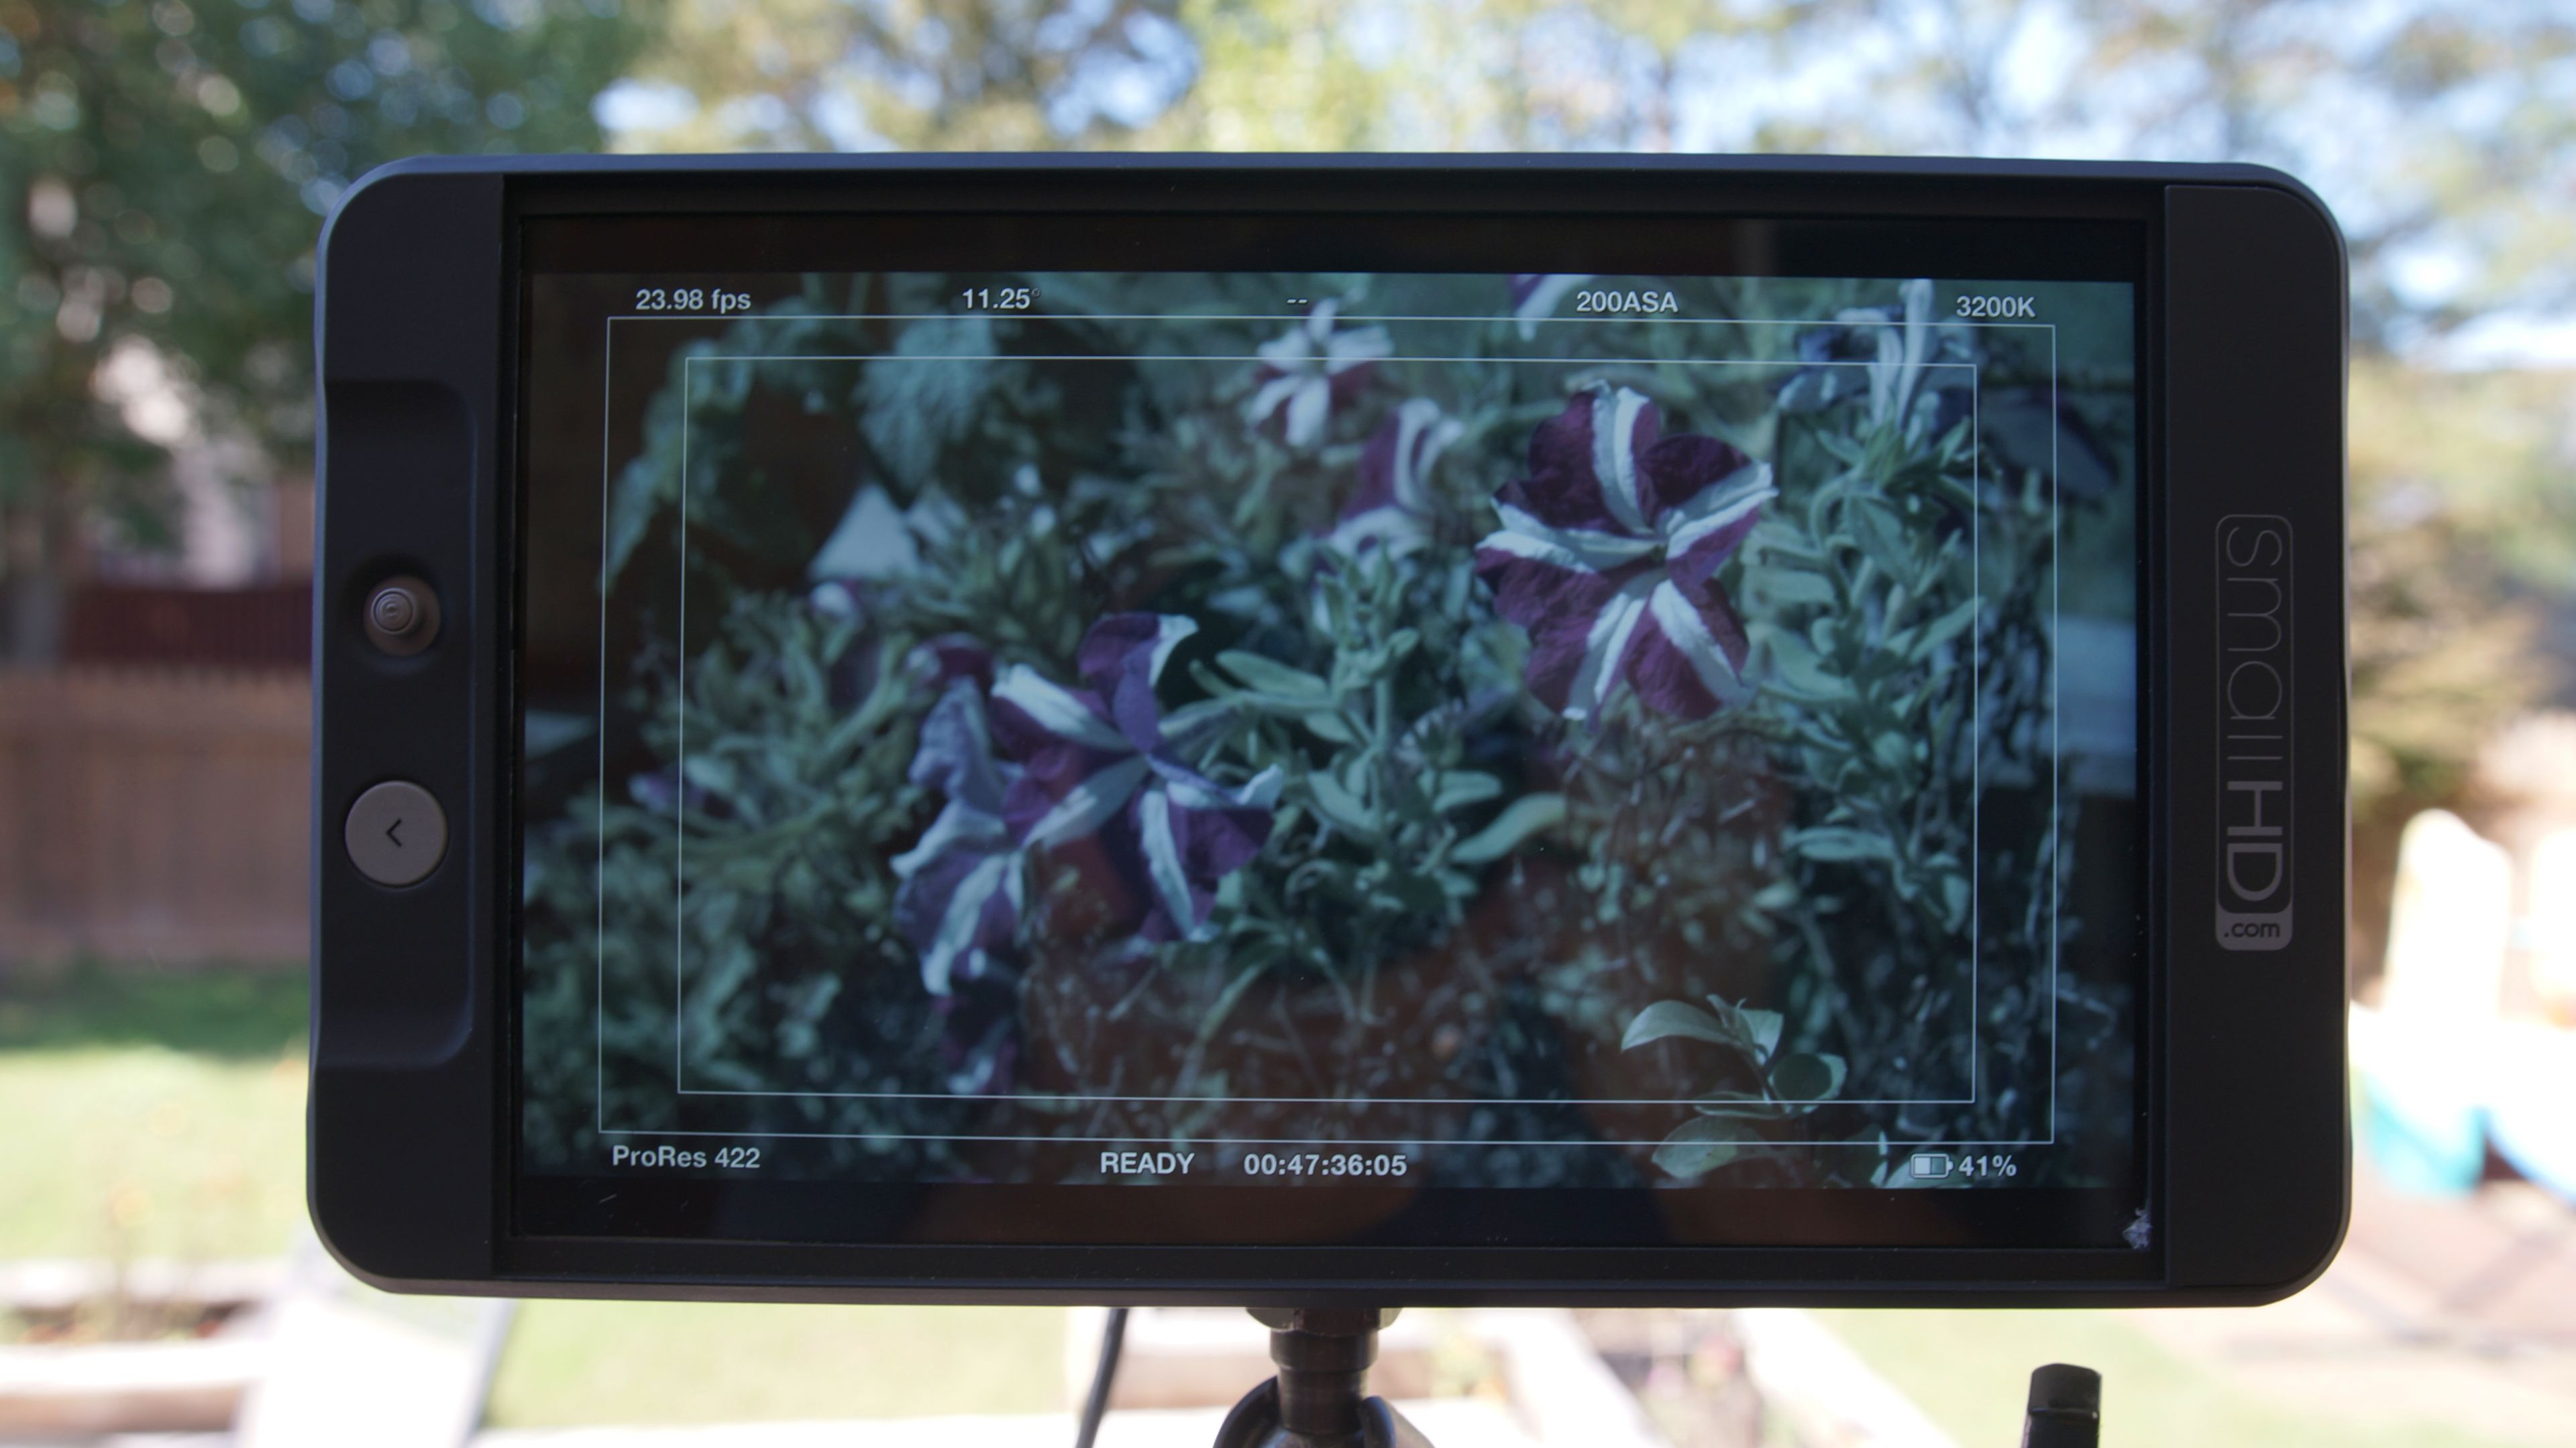 SmallHD 702 Monitor Review